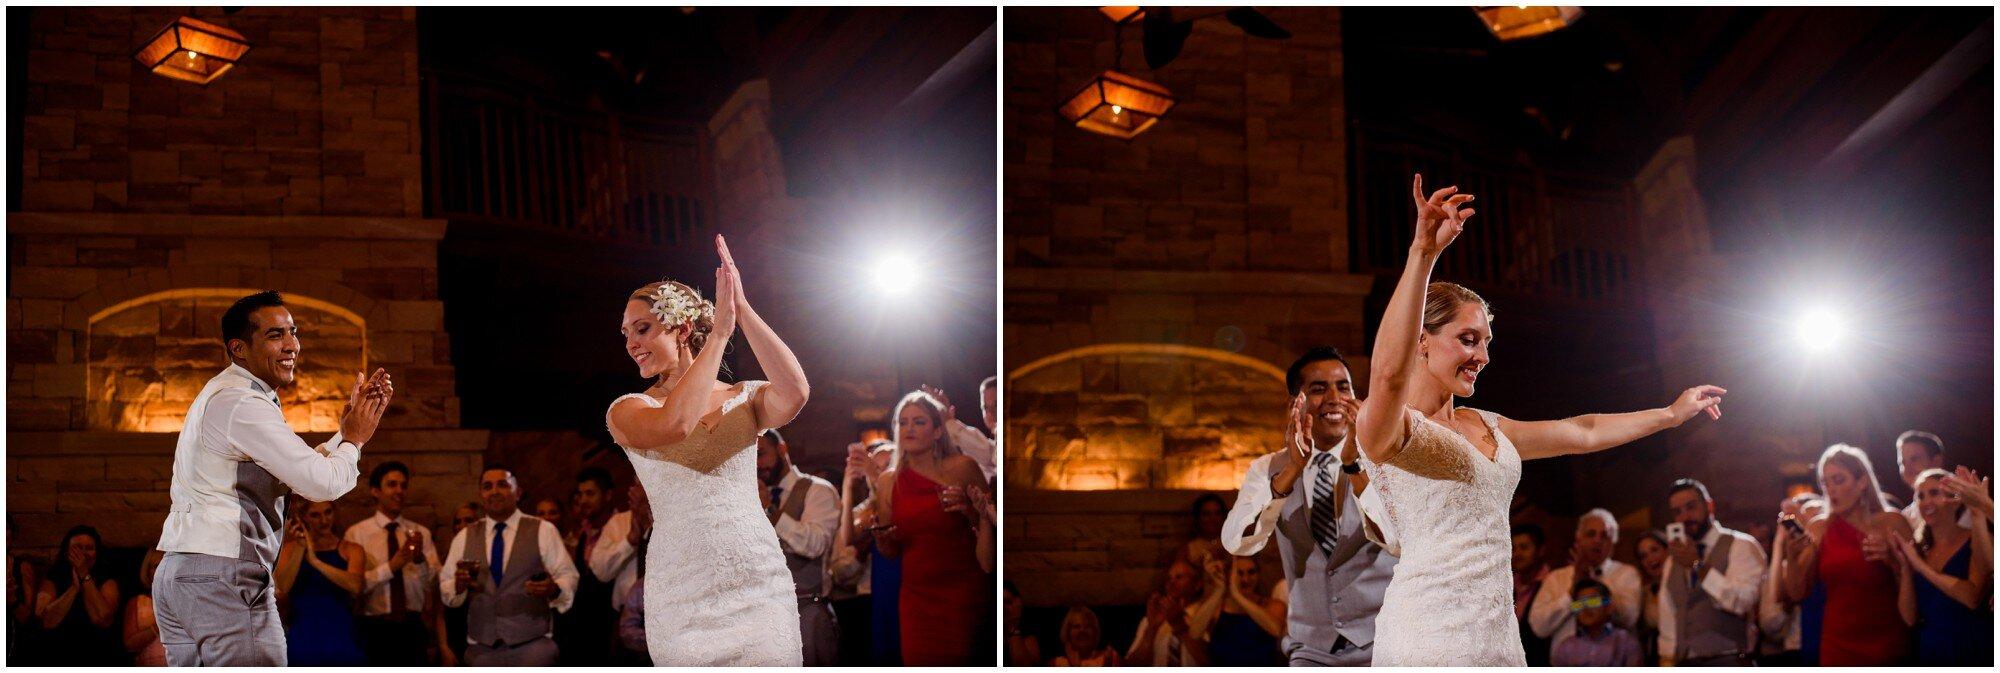 first wedding dance salsa in denver colorado